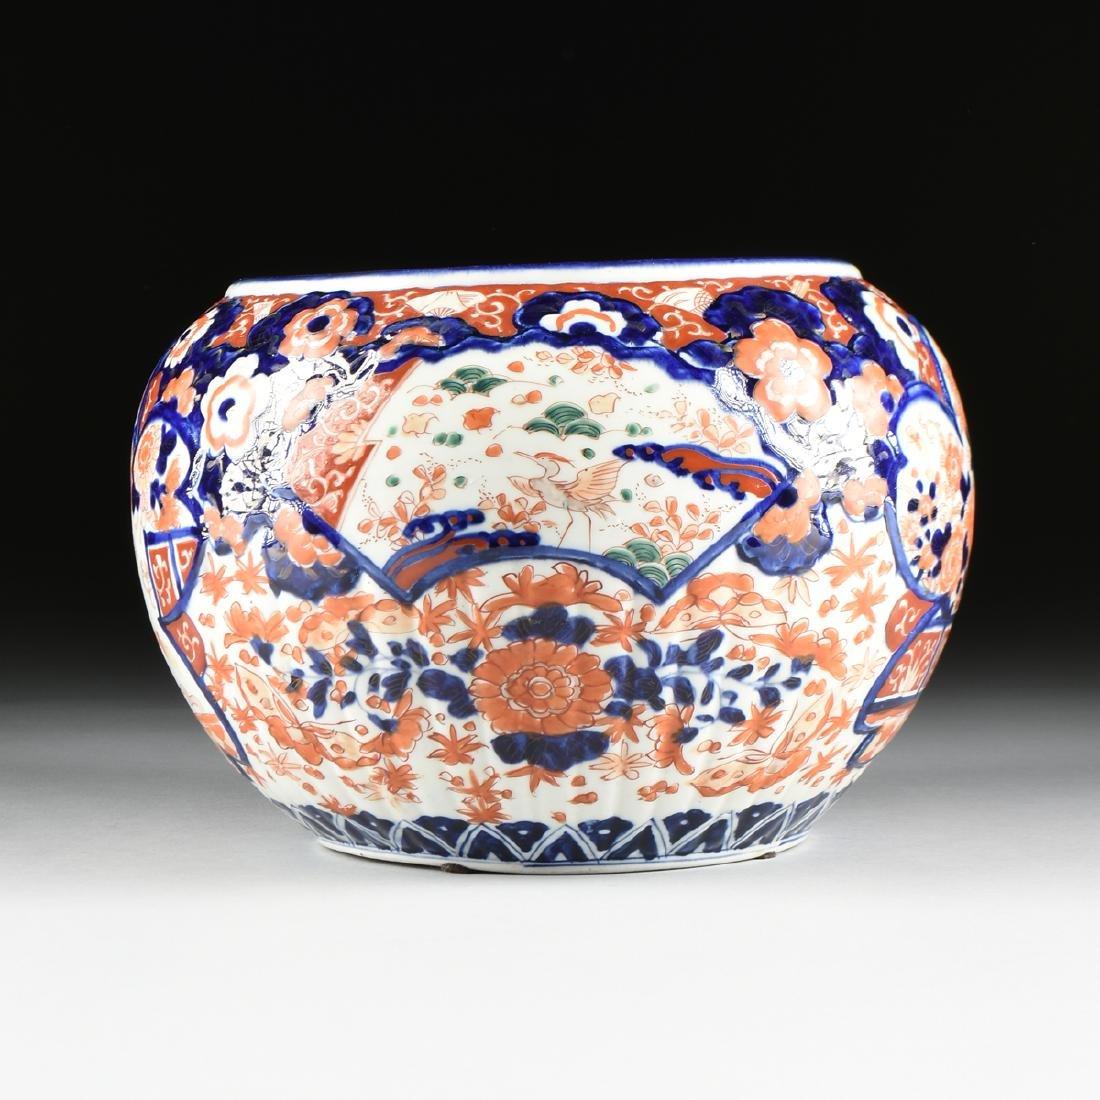 AN ENAMELED IMARI PORCELAIN CACHEPOT, JAPANESE, - 6